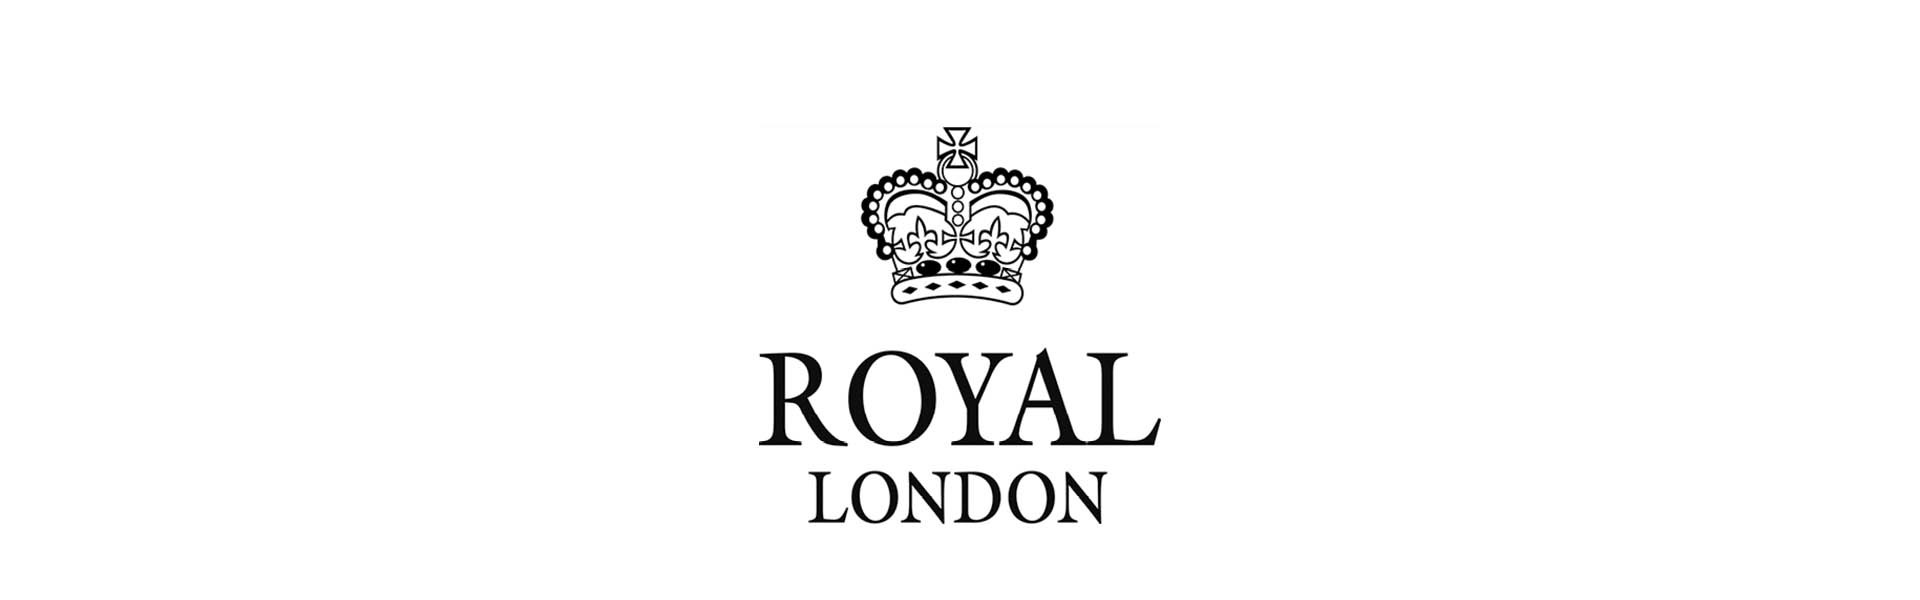 De mooiste (zak)horloges van Royal London.